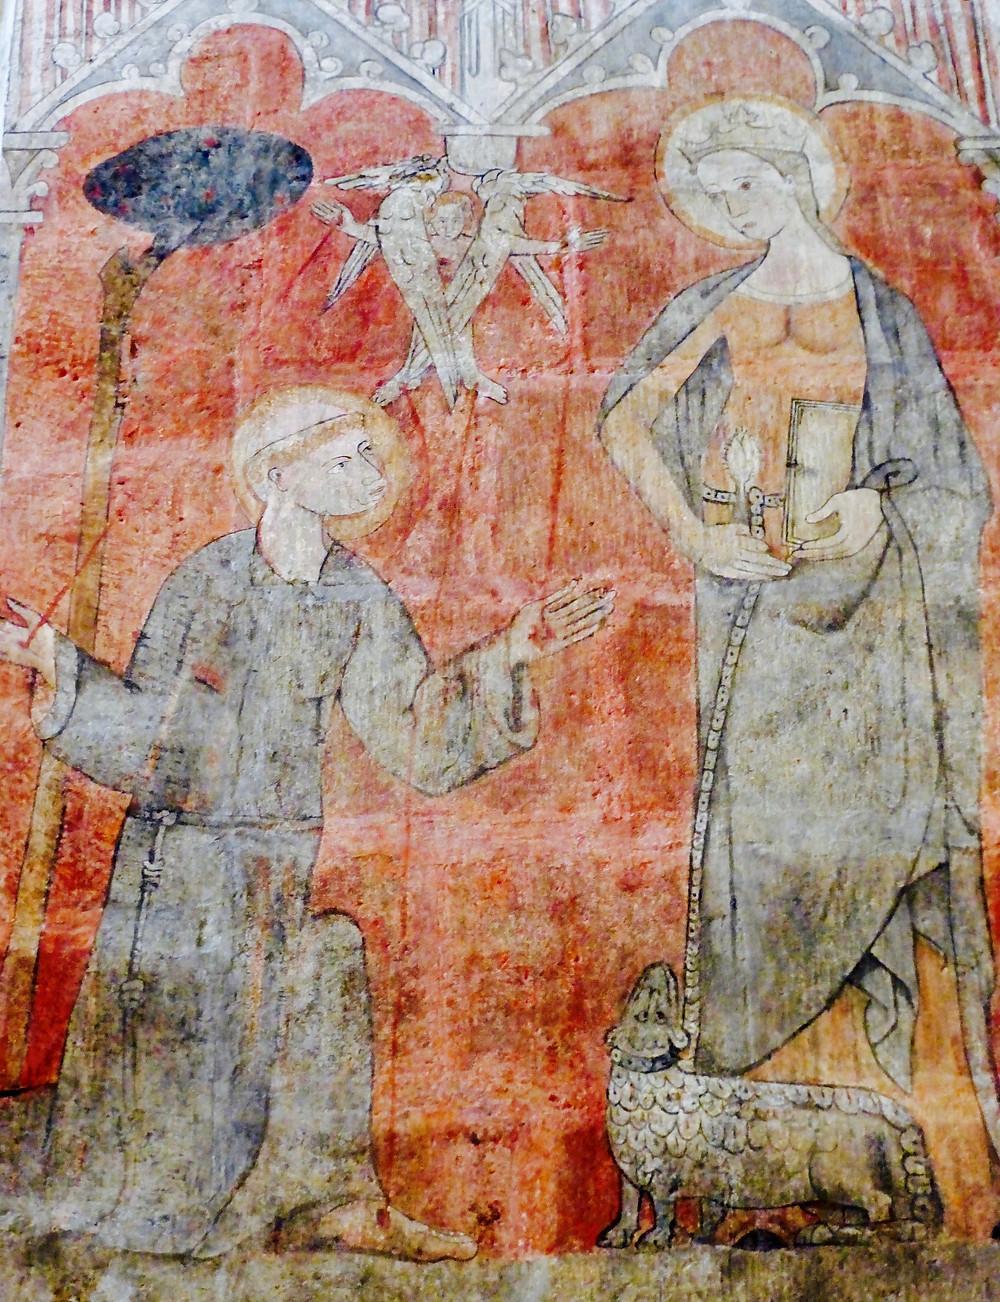 Mural in Burgos, Spain Cathedral